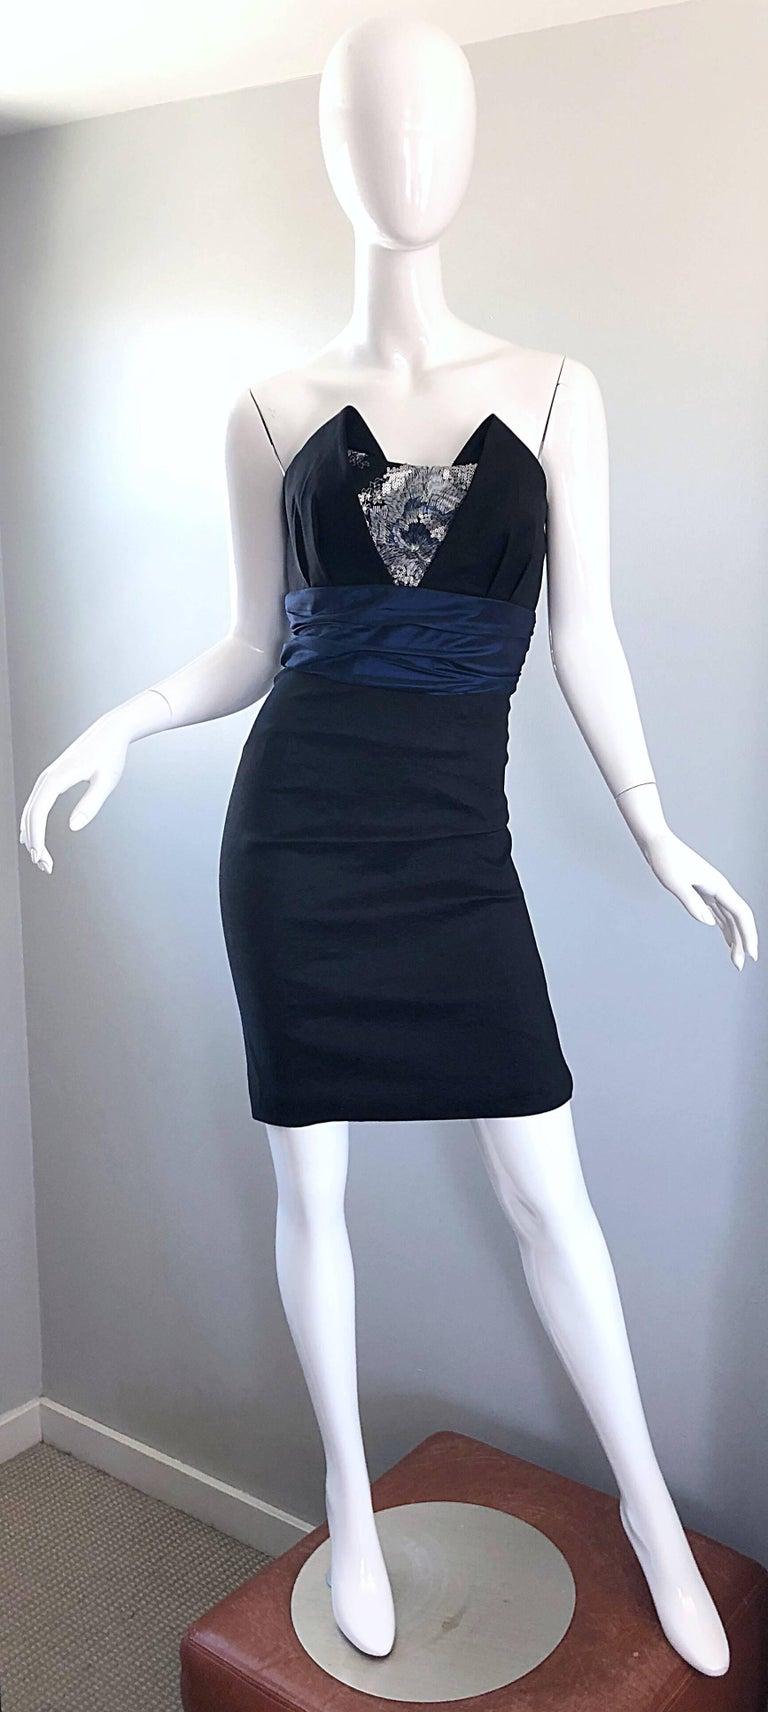 Badgley Mischka 1990s Sz 4 Vintage Avant Garde Black Navy Blue Sequin Mini Dress For Sale 5